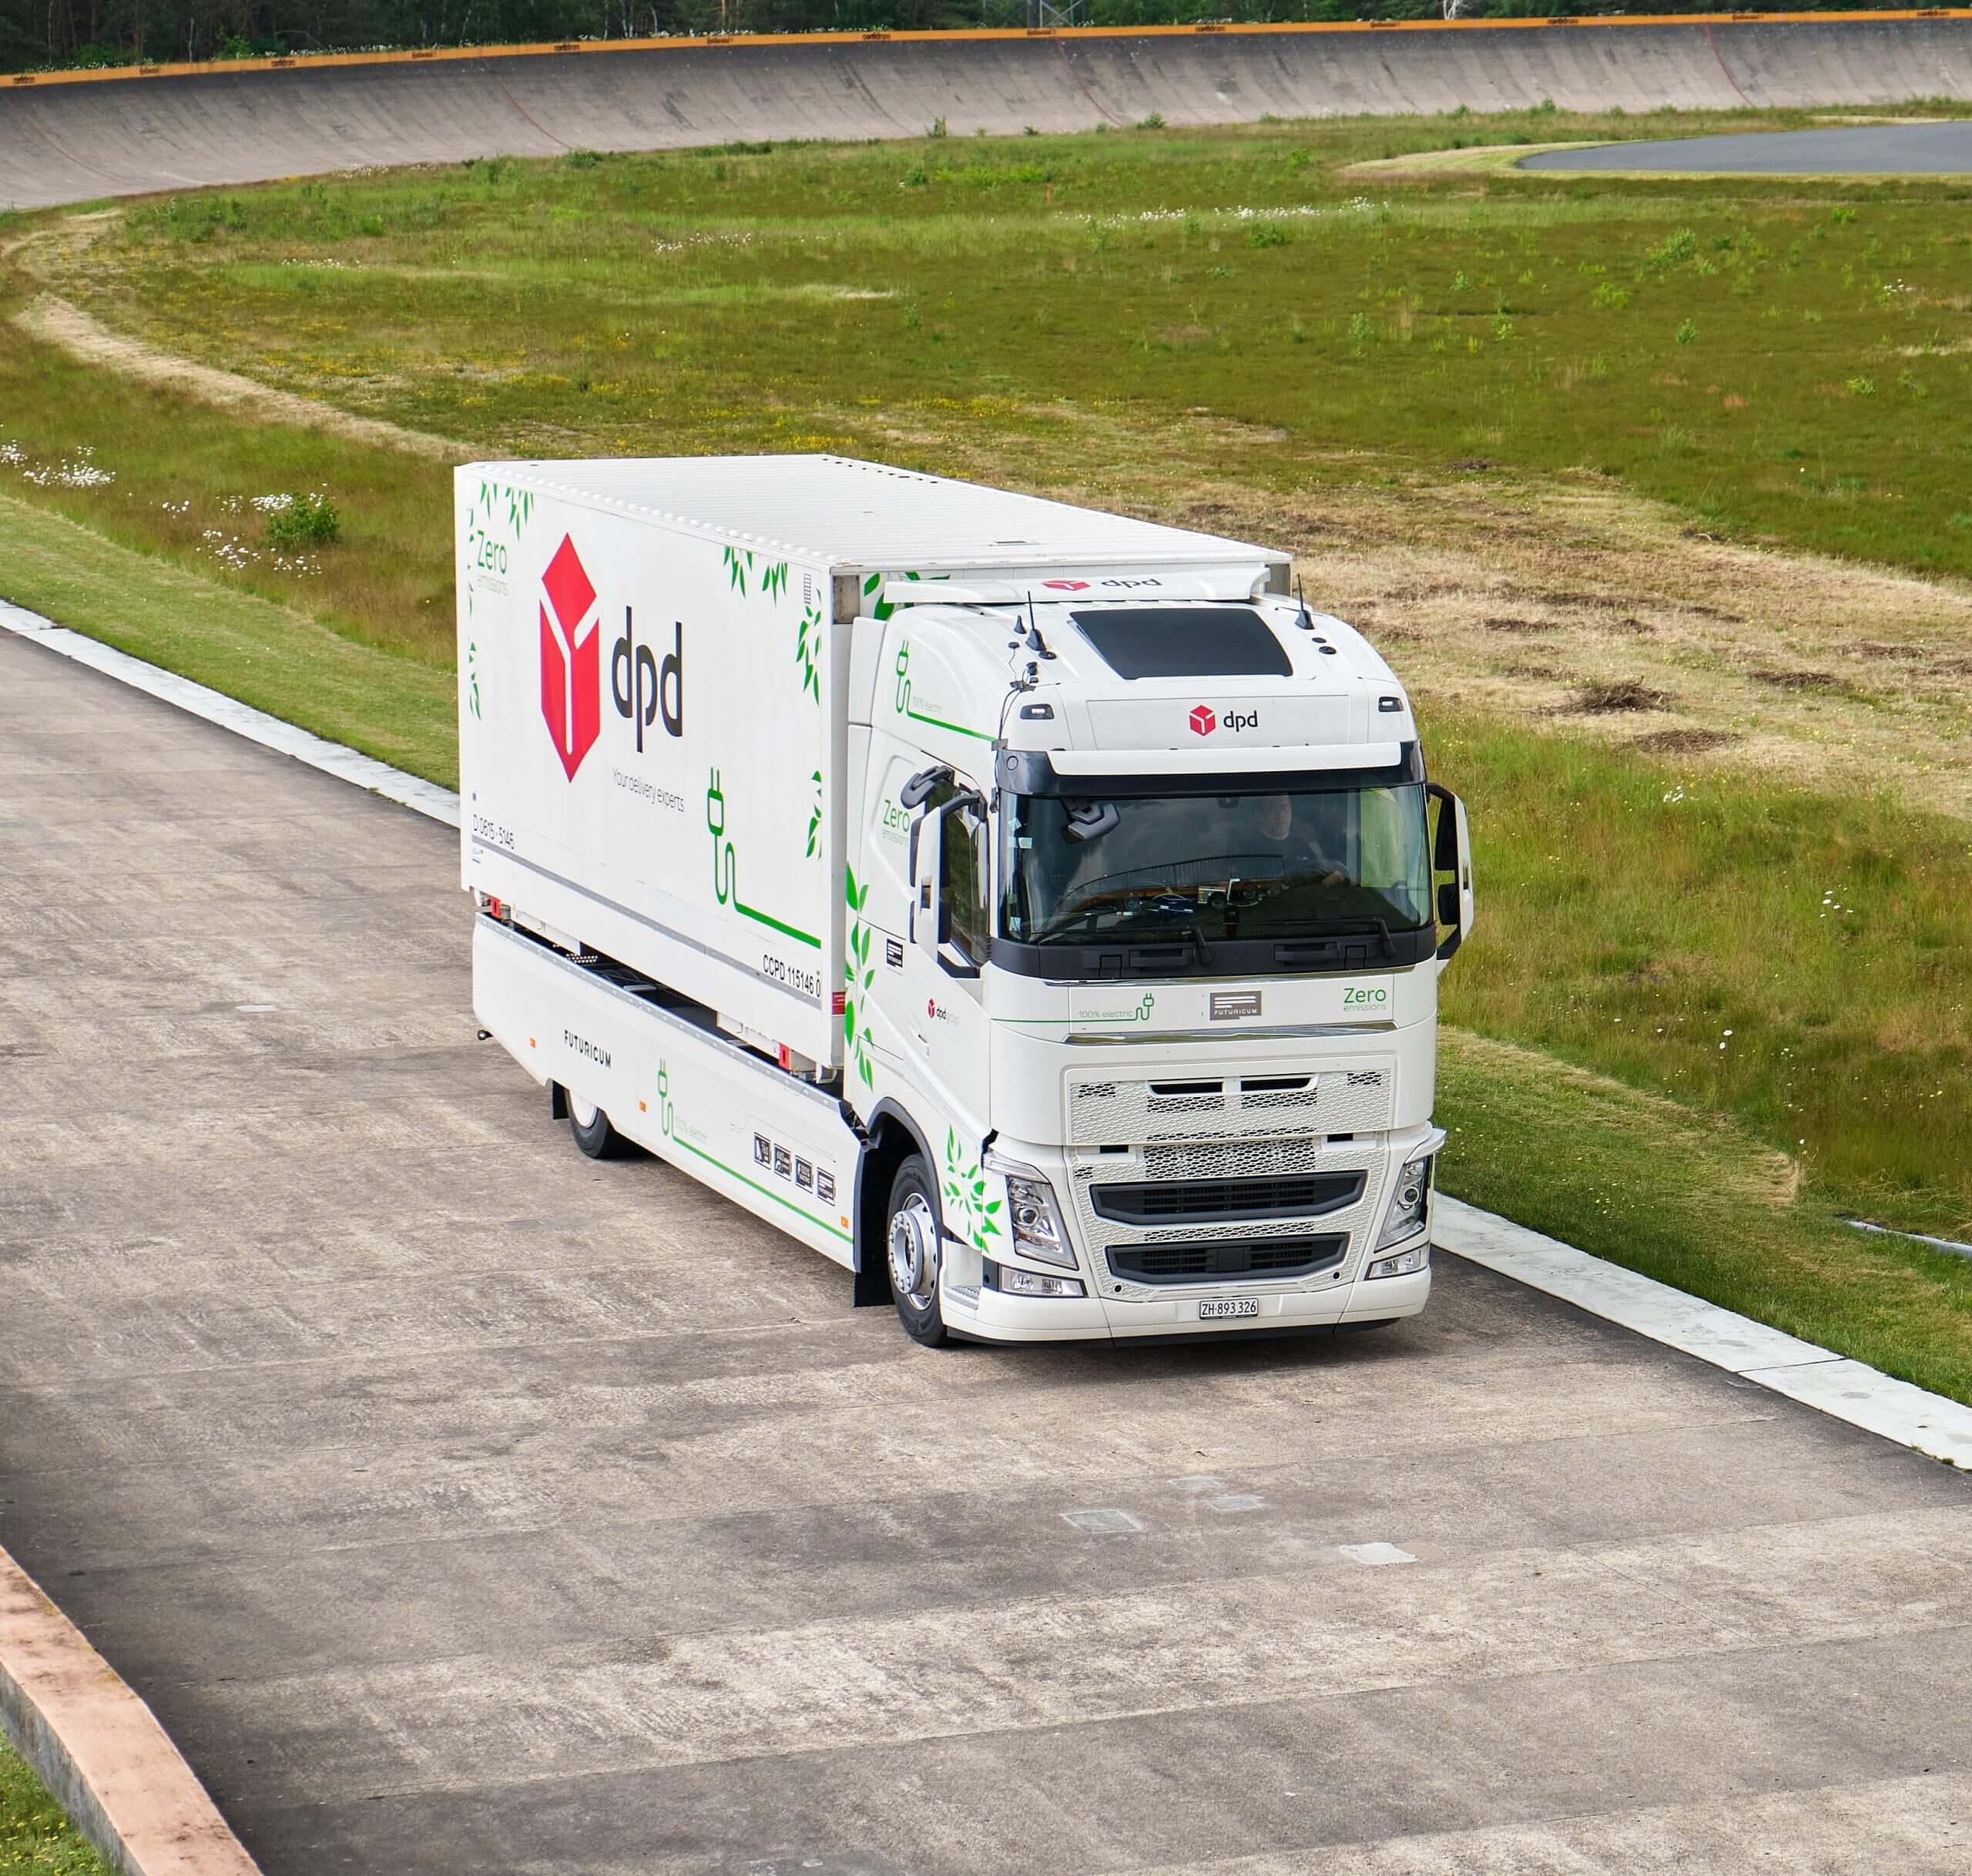 Электрический грузовик Futuricum установил рекорд пробега на одной зарядке